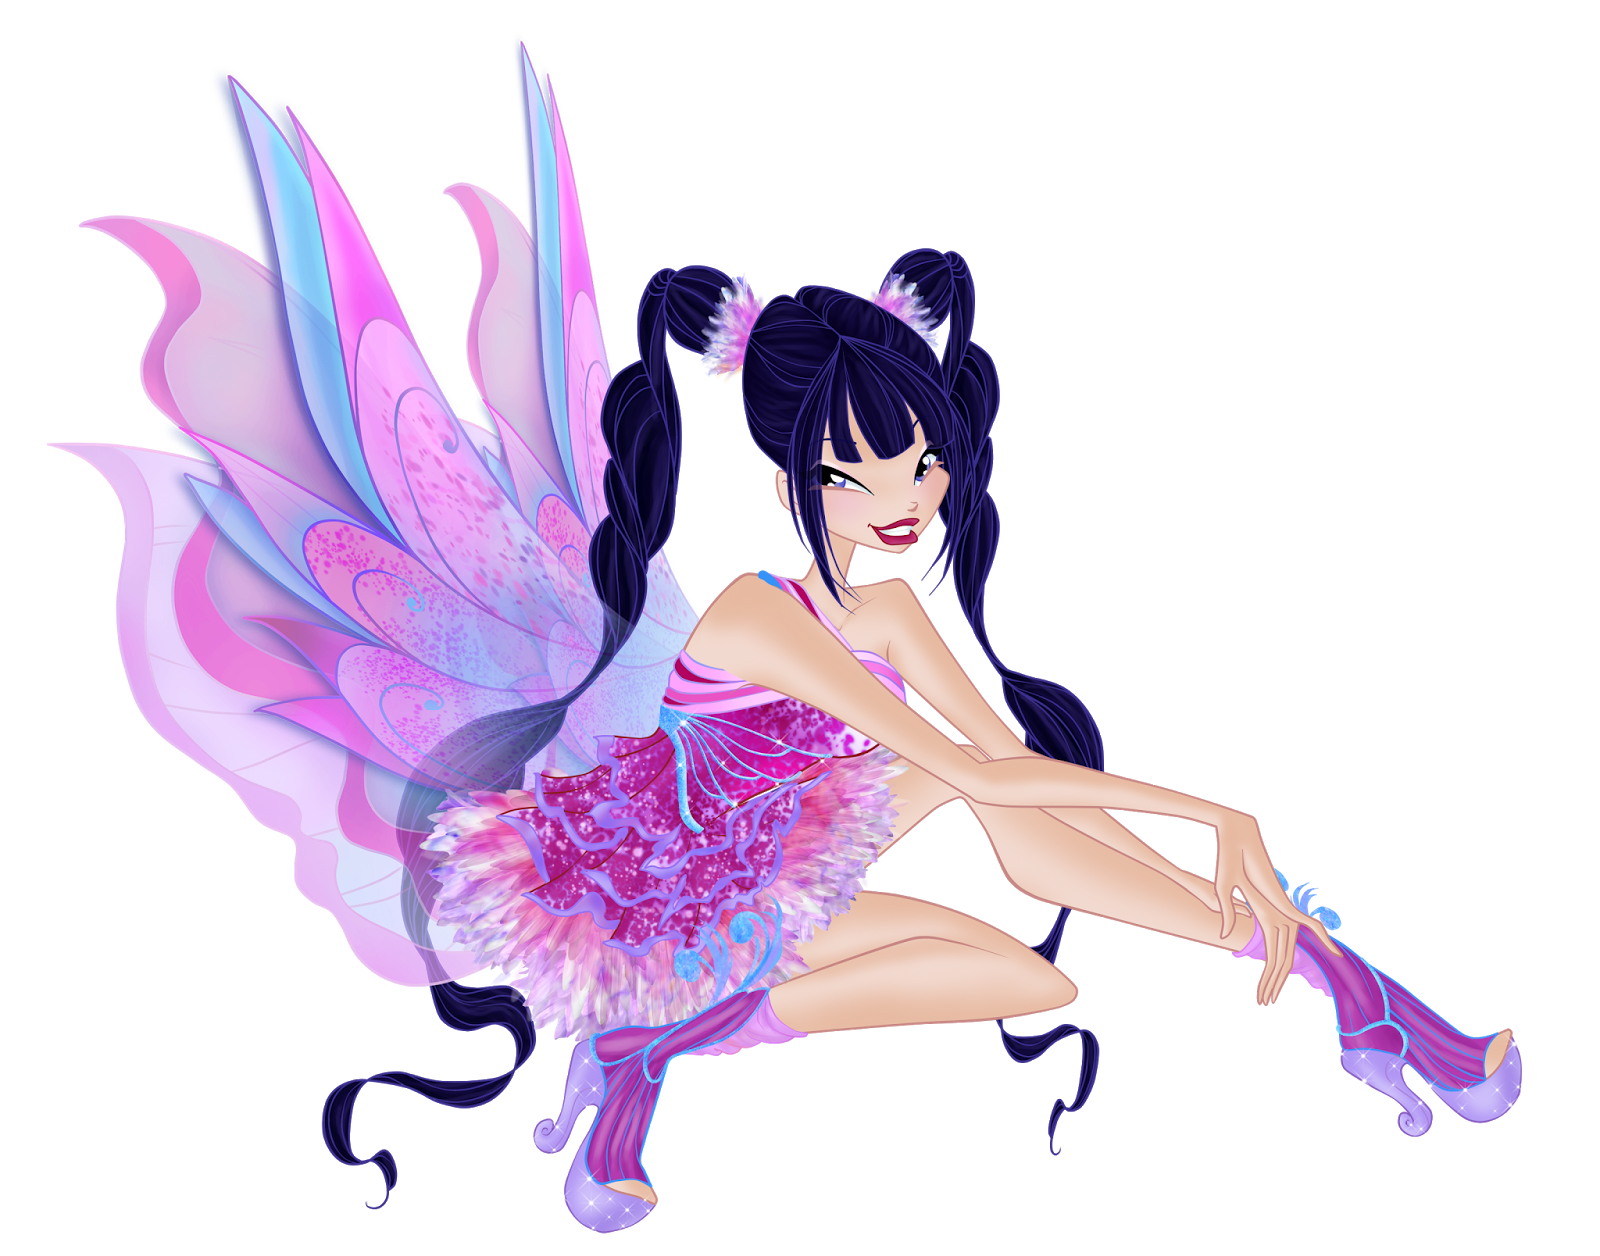 Winx Club Fairies: Mythix Transformation Картинки Раскраски Винкс Блум